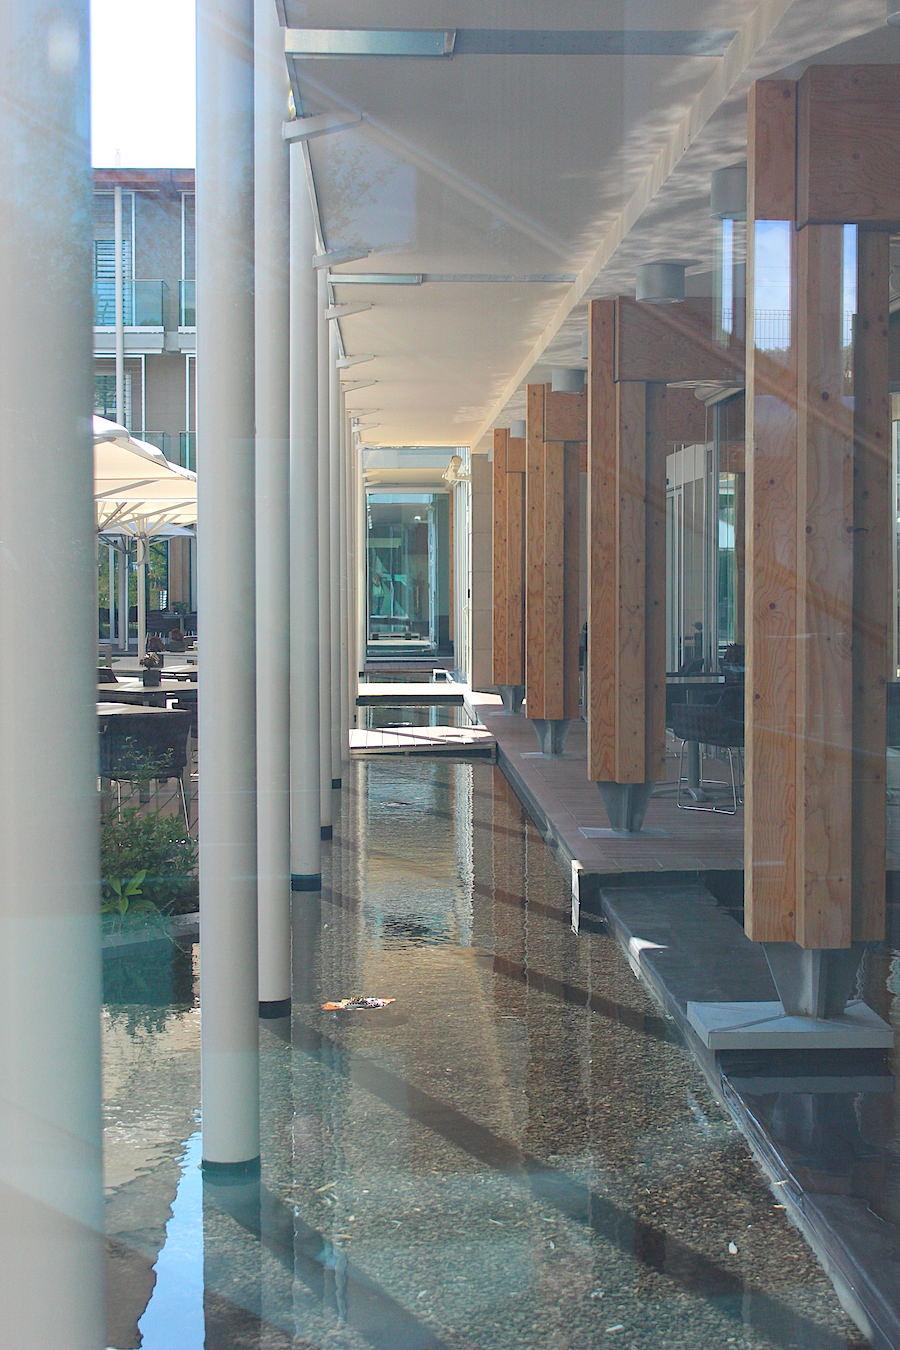 ITB Globetrotter - Aqualux Hotel Bardolino 2